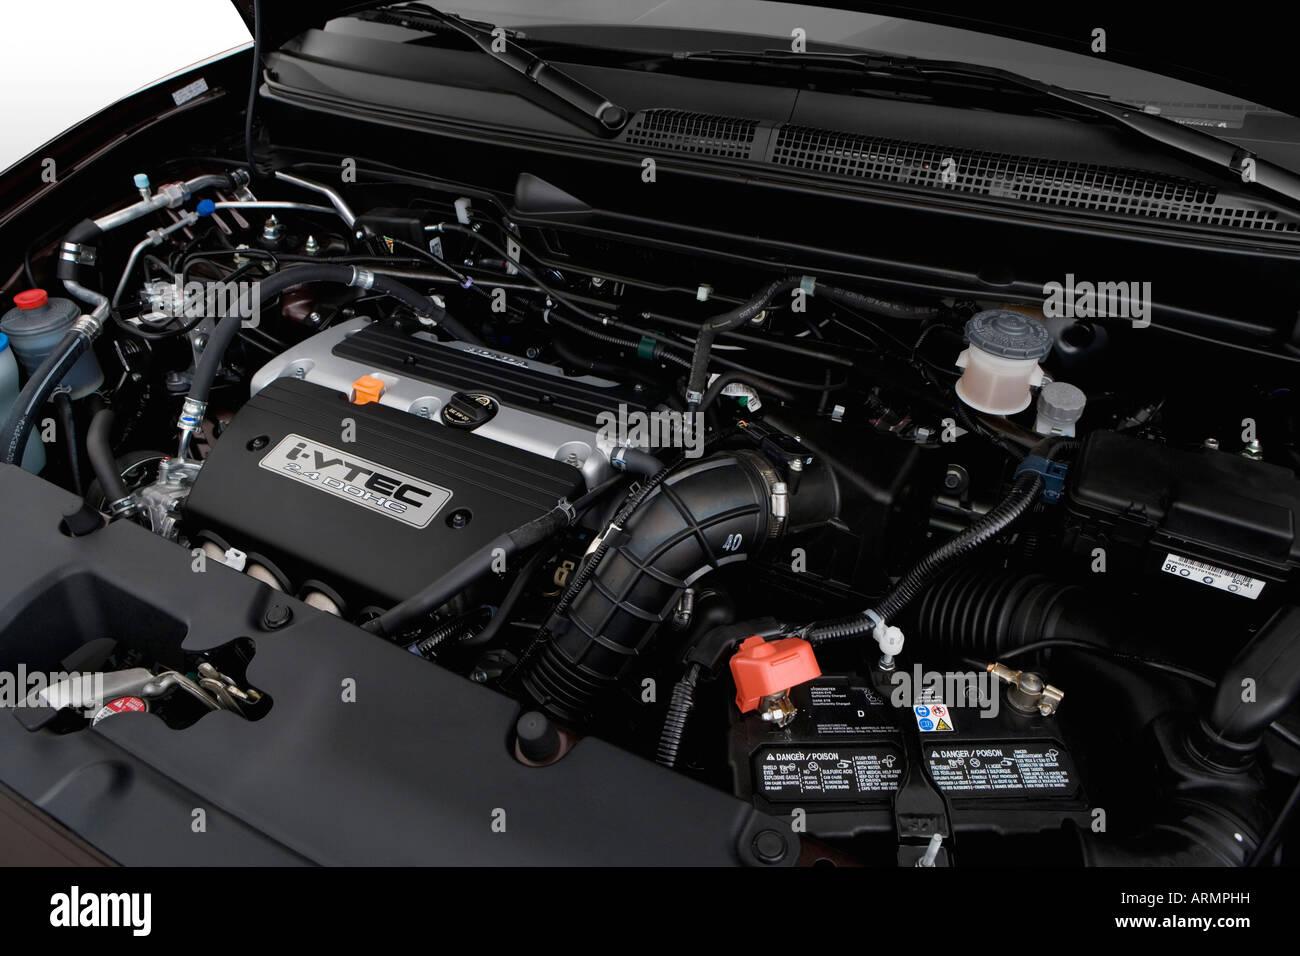 2008 Honda Element SC In Beige   Engine   Stock Image